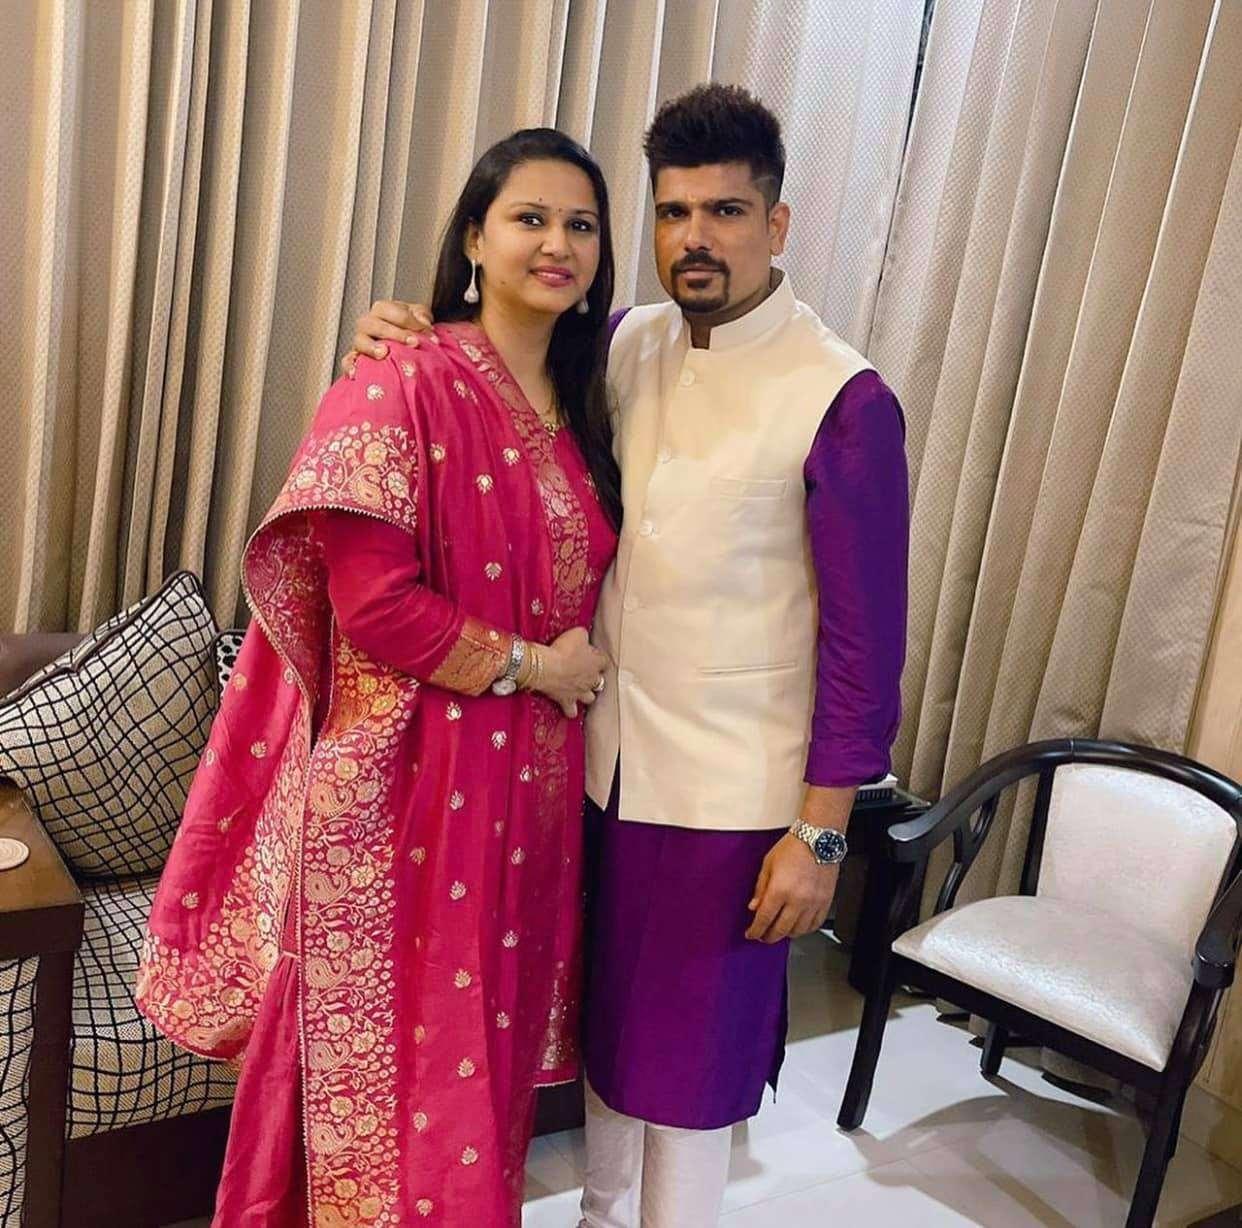 Karn Sharma with his wife Nidhi Sharma